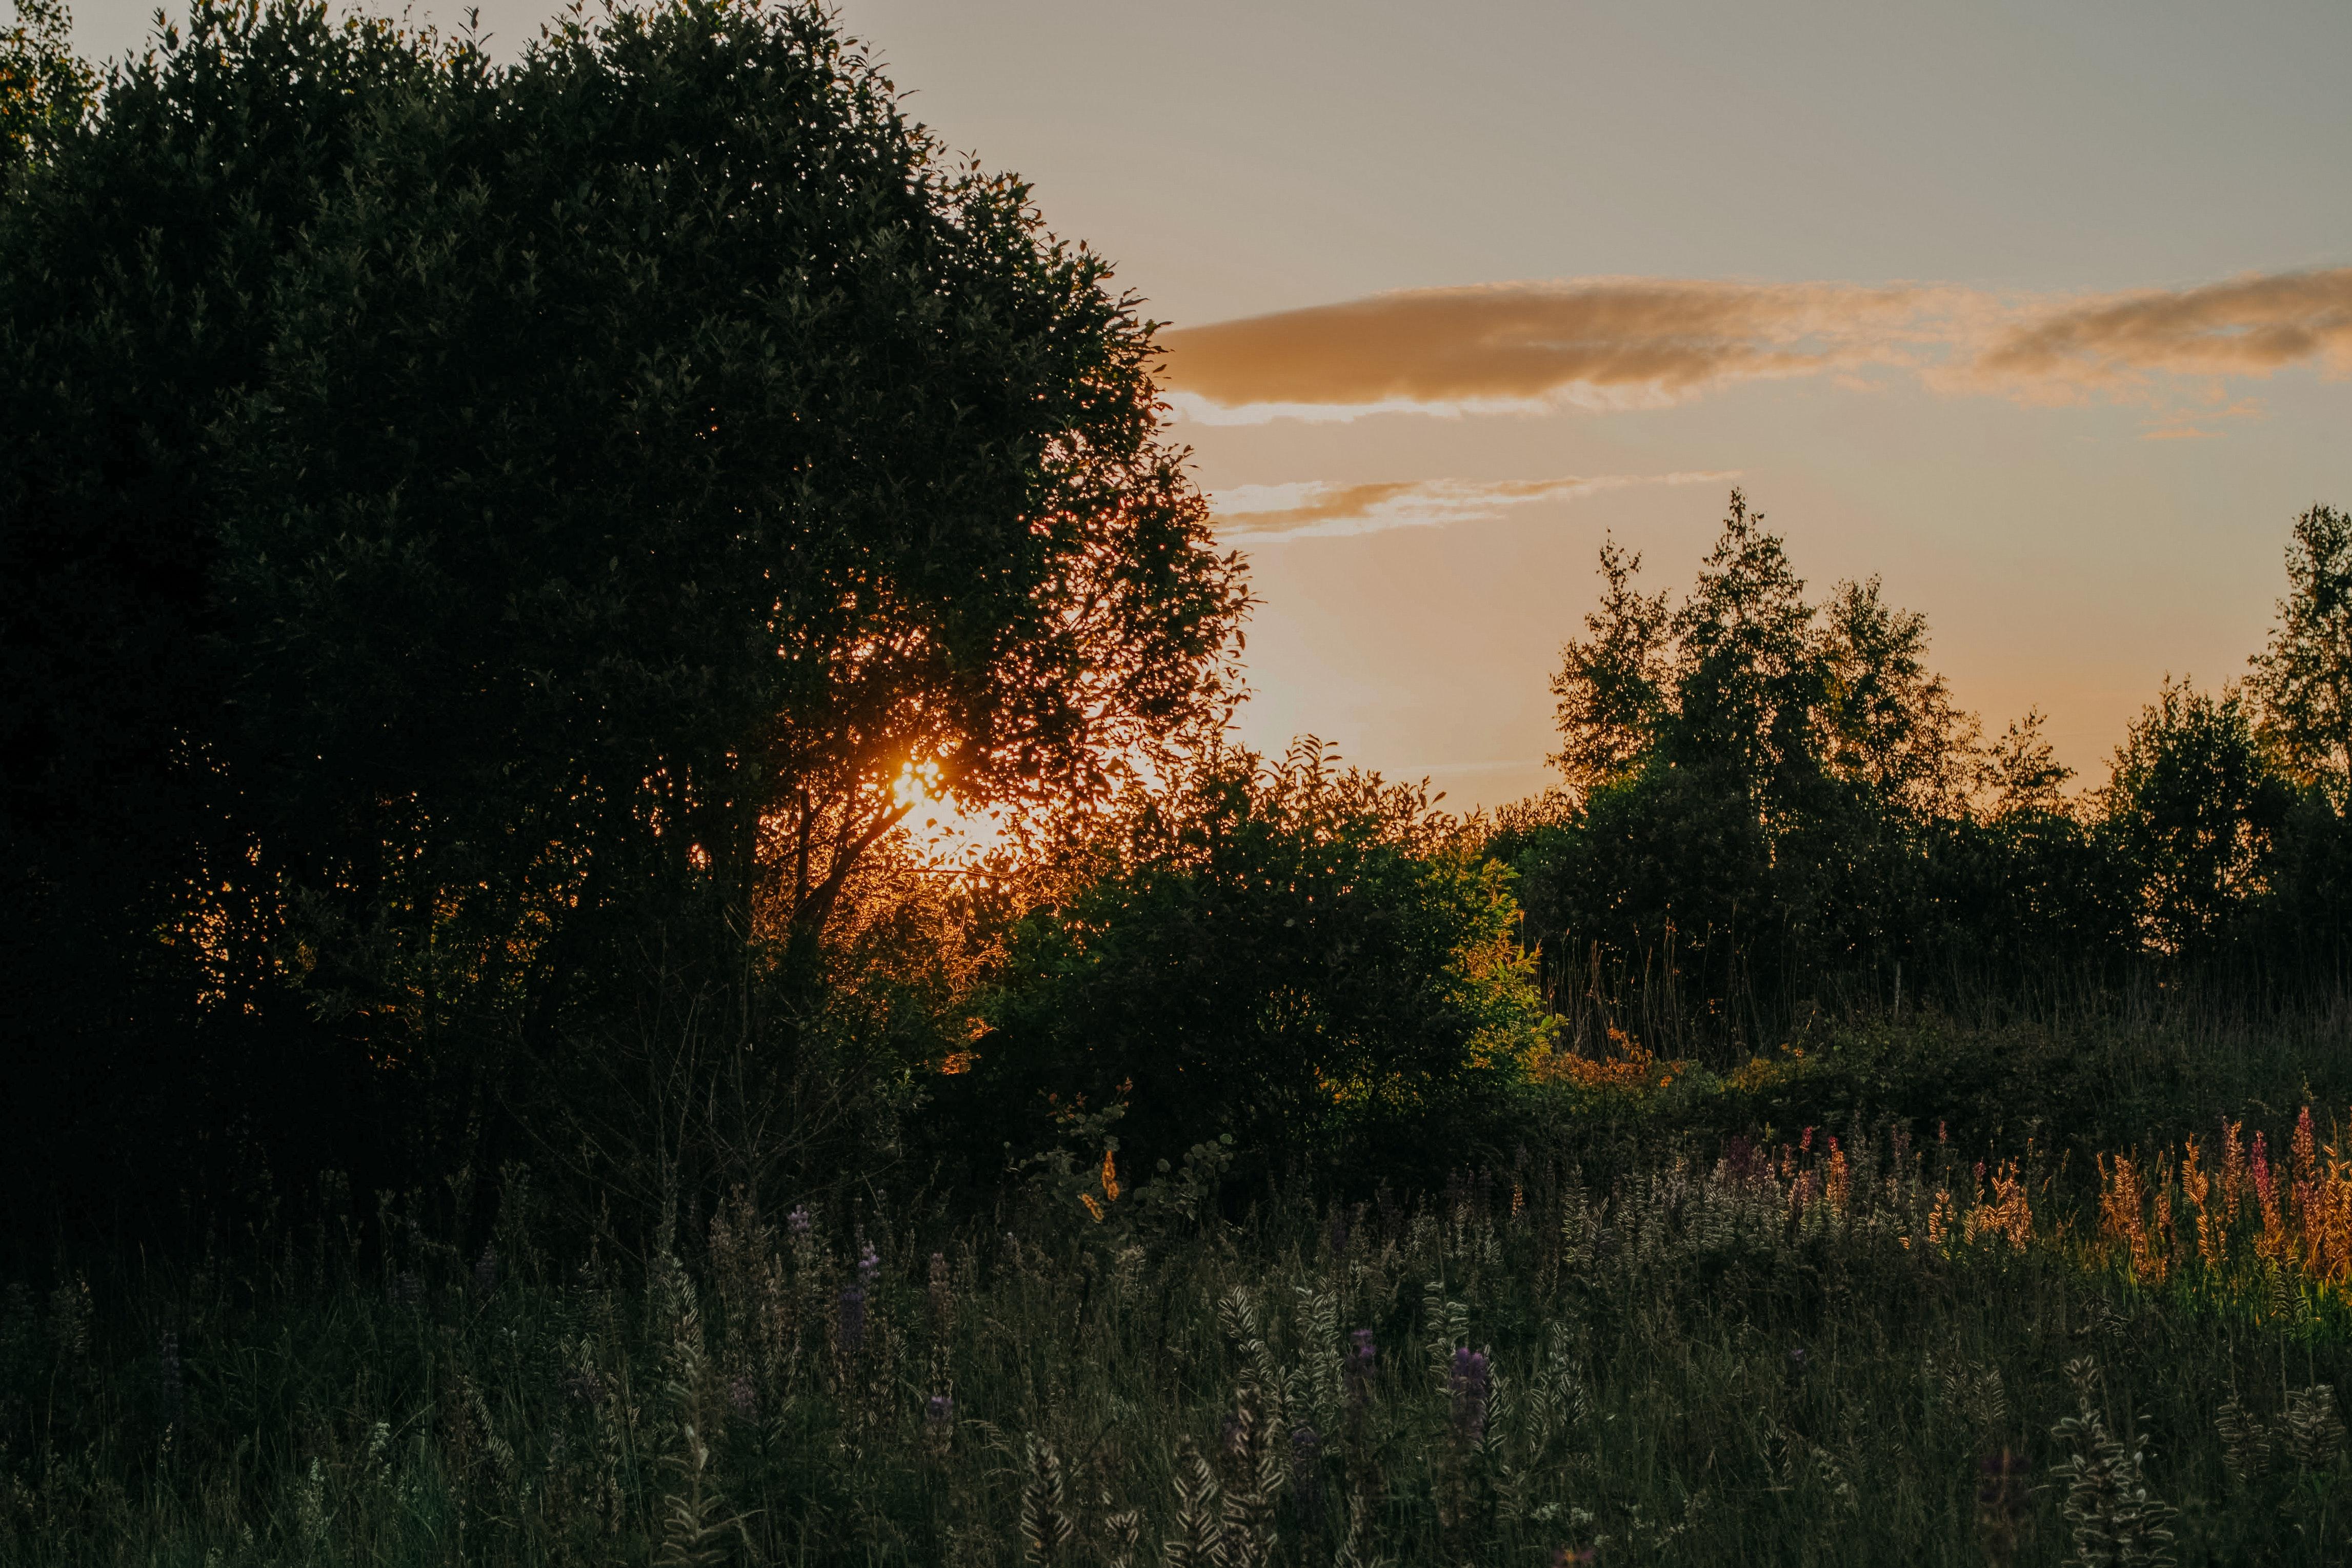 Grass Field and Trees during Sunset, Beautiful, Light, Sunset, Sun, HQ Photo